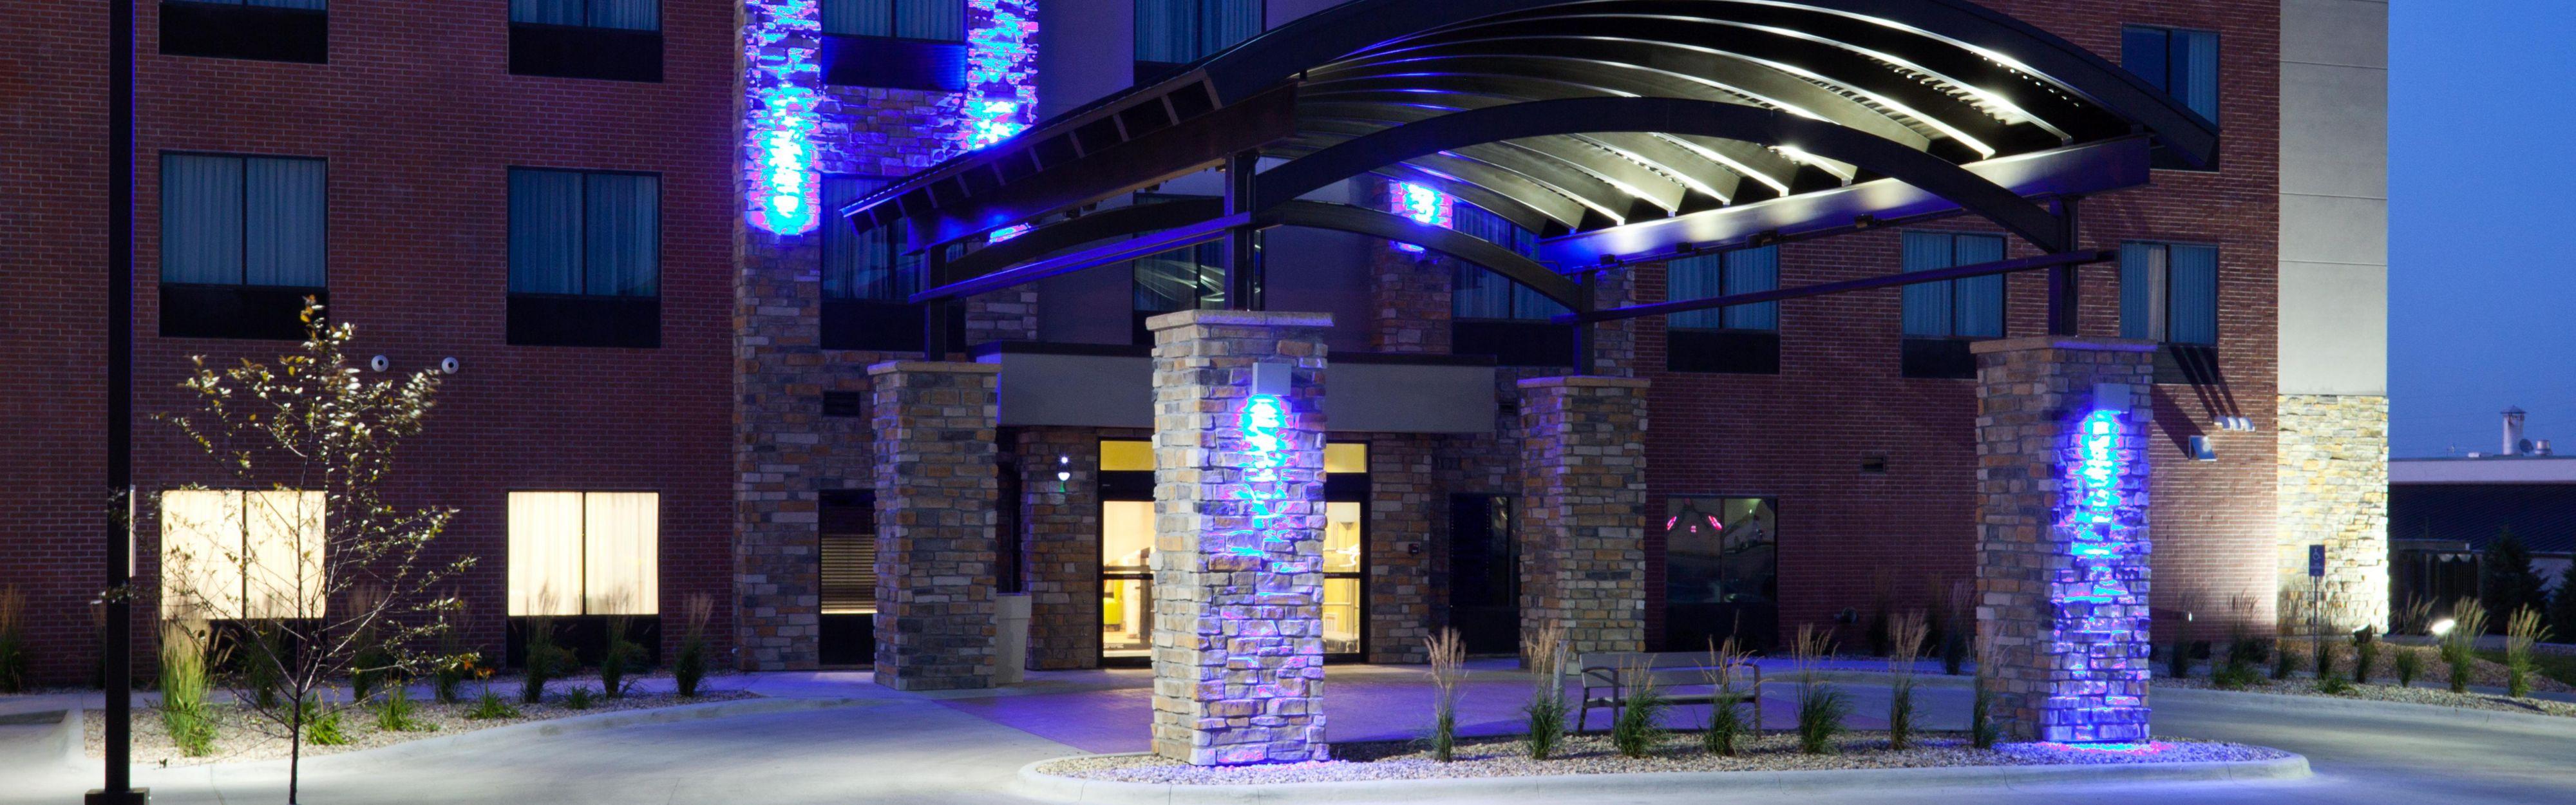 Holiday Inn Express & Suites Fort Dodge image 0